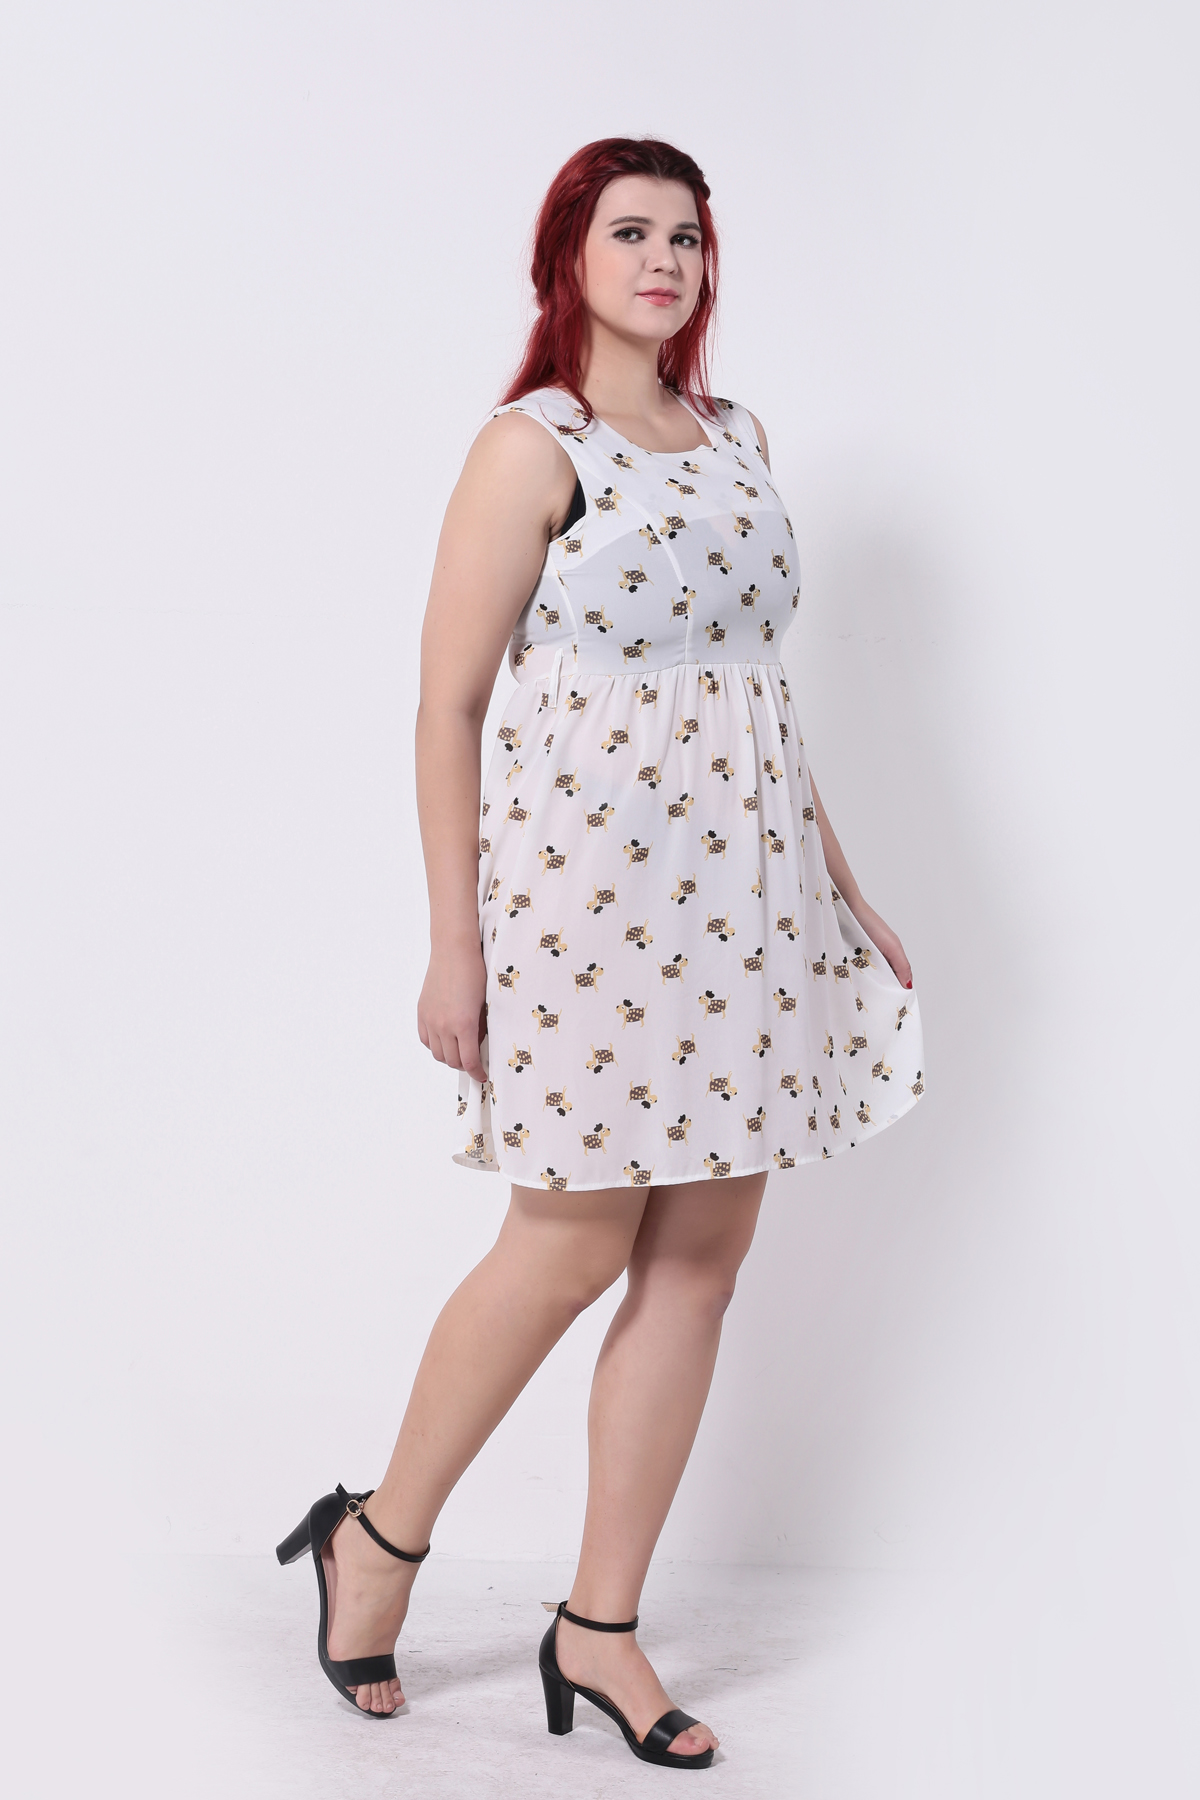 c2ac106e0fc4 Brand Summer Sleeveless Women Dress Cute Sausage Dog Print Chiffon Skater  Dresses Plus Size 5XL 6XL Free Belt High Quality-in Dresses from Women s  Clothing ...